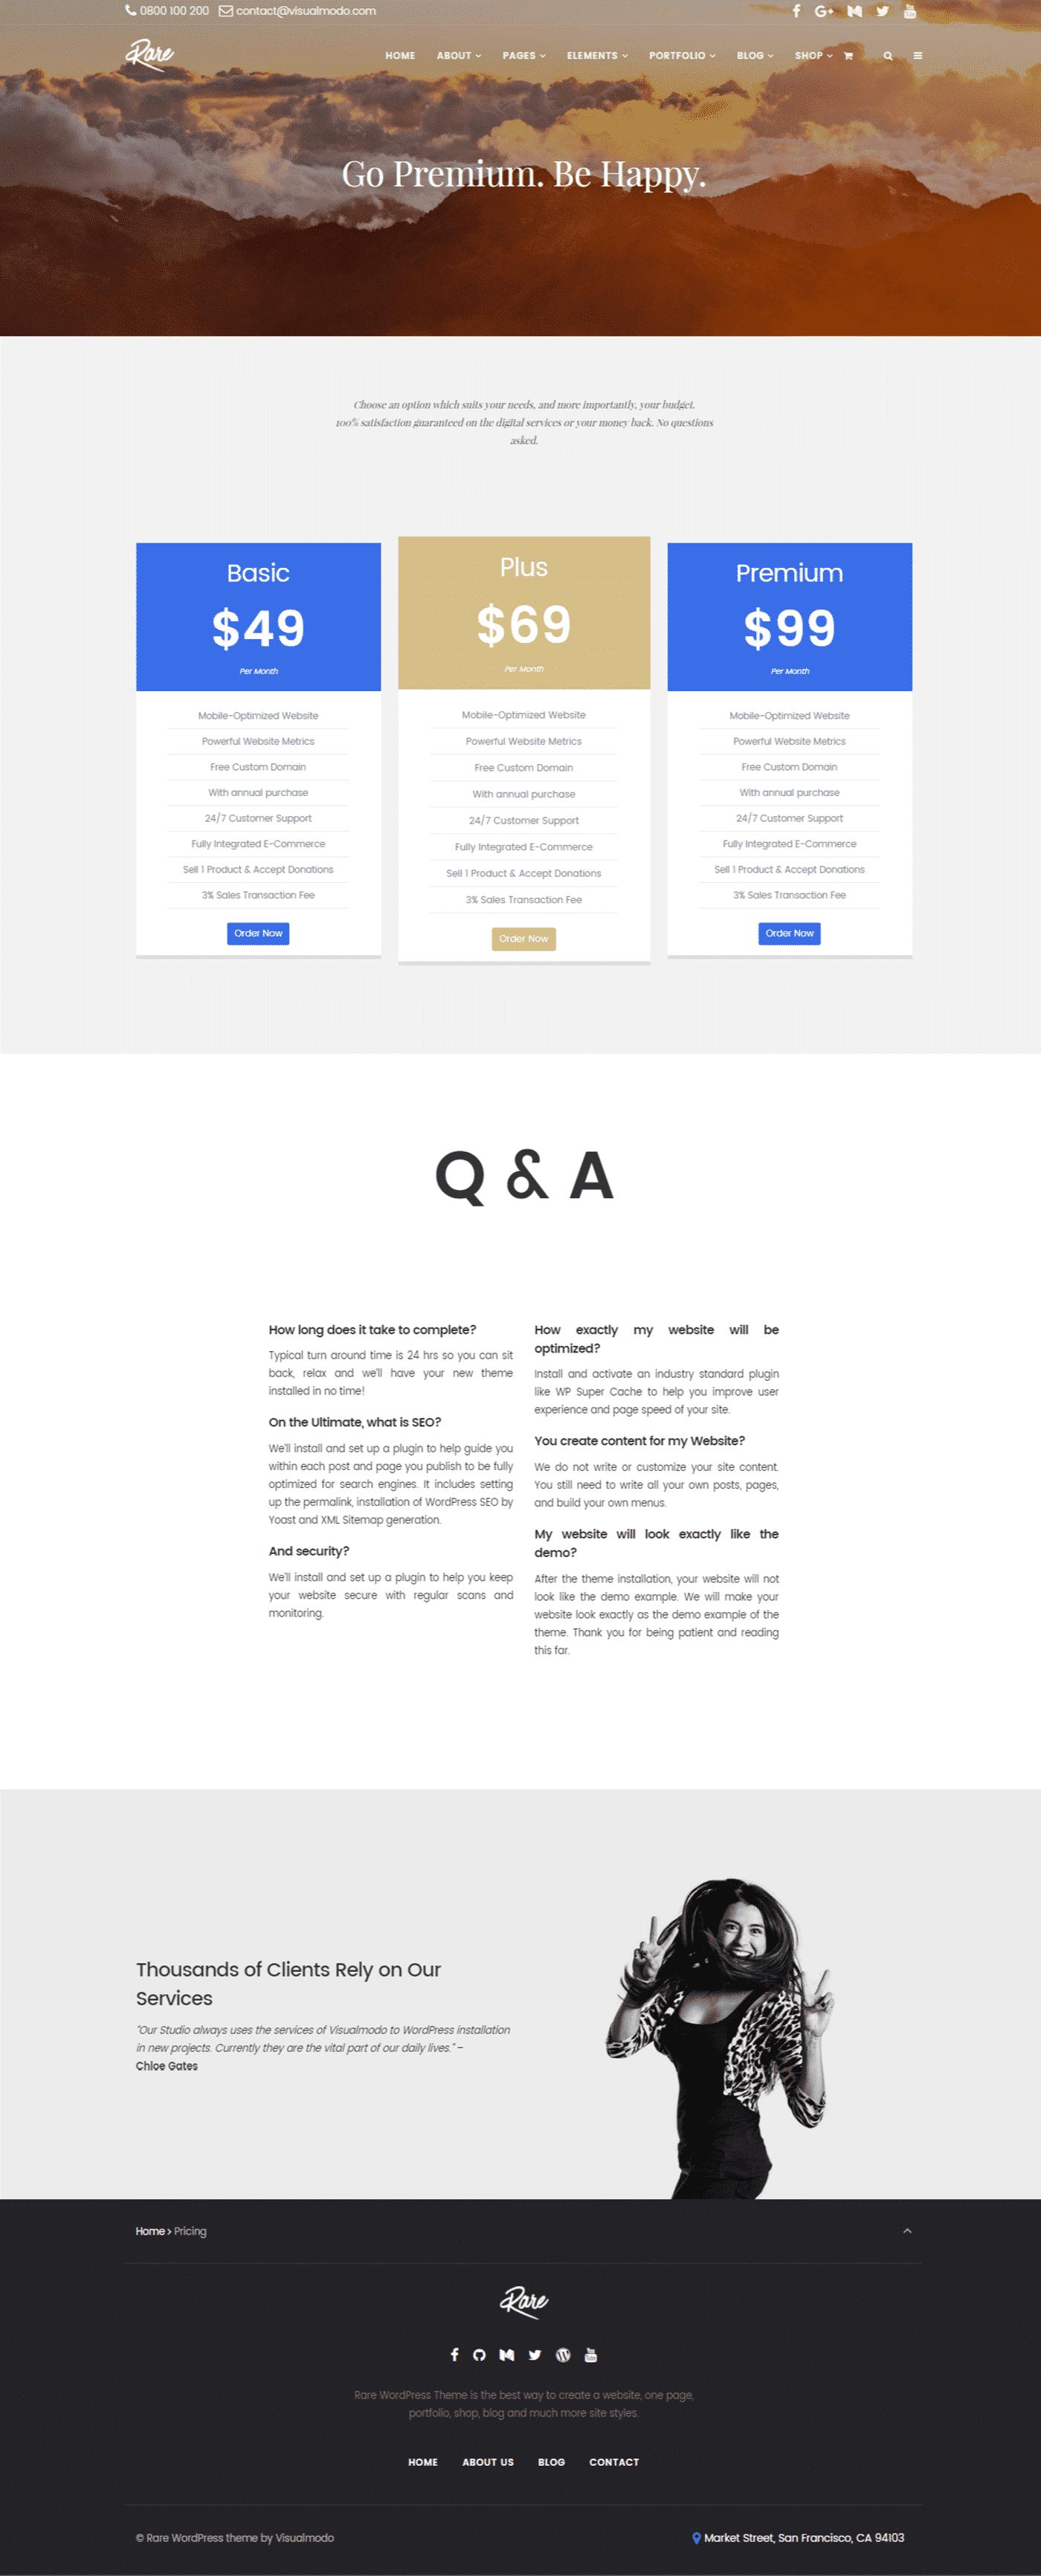 Rare WordPress Theme Screenshots from demonstrative site